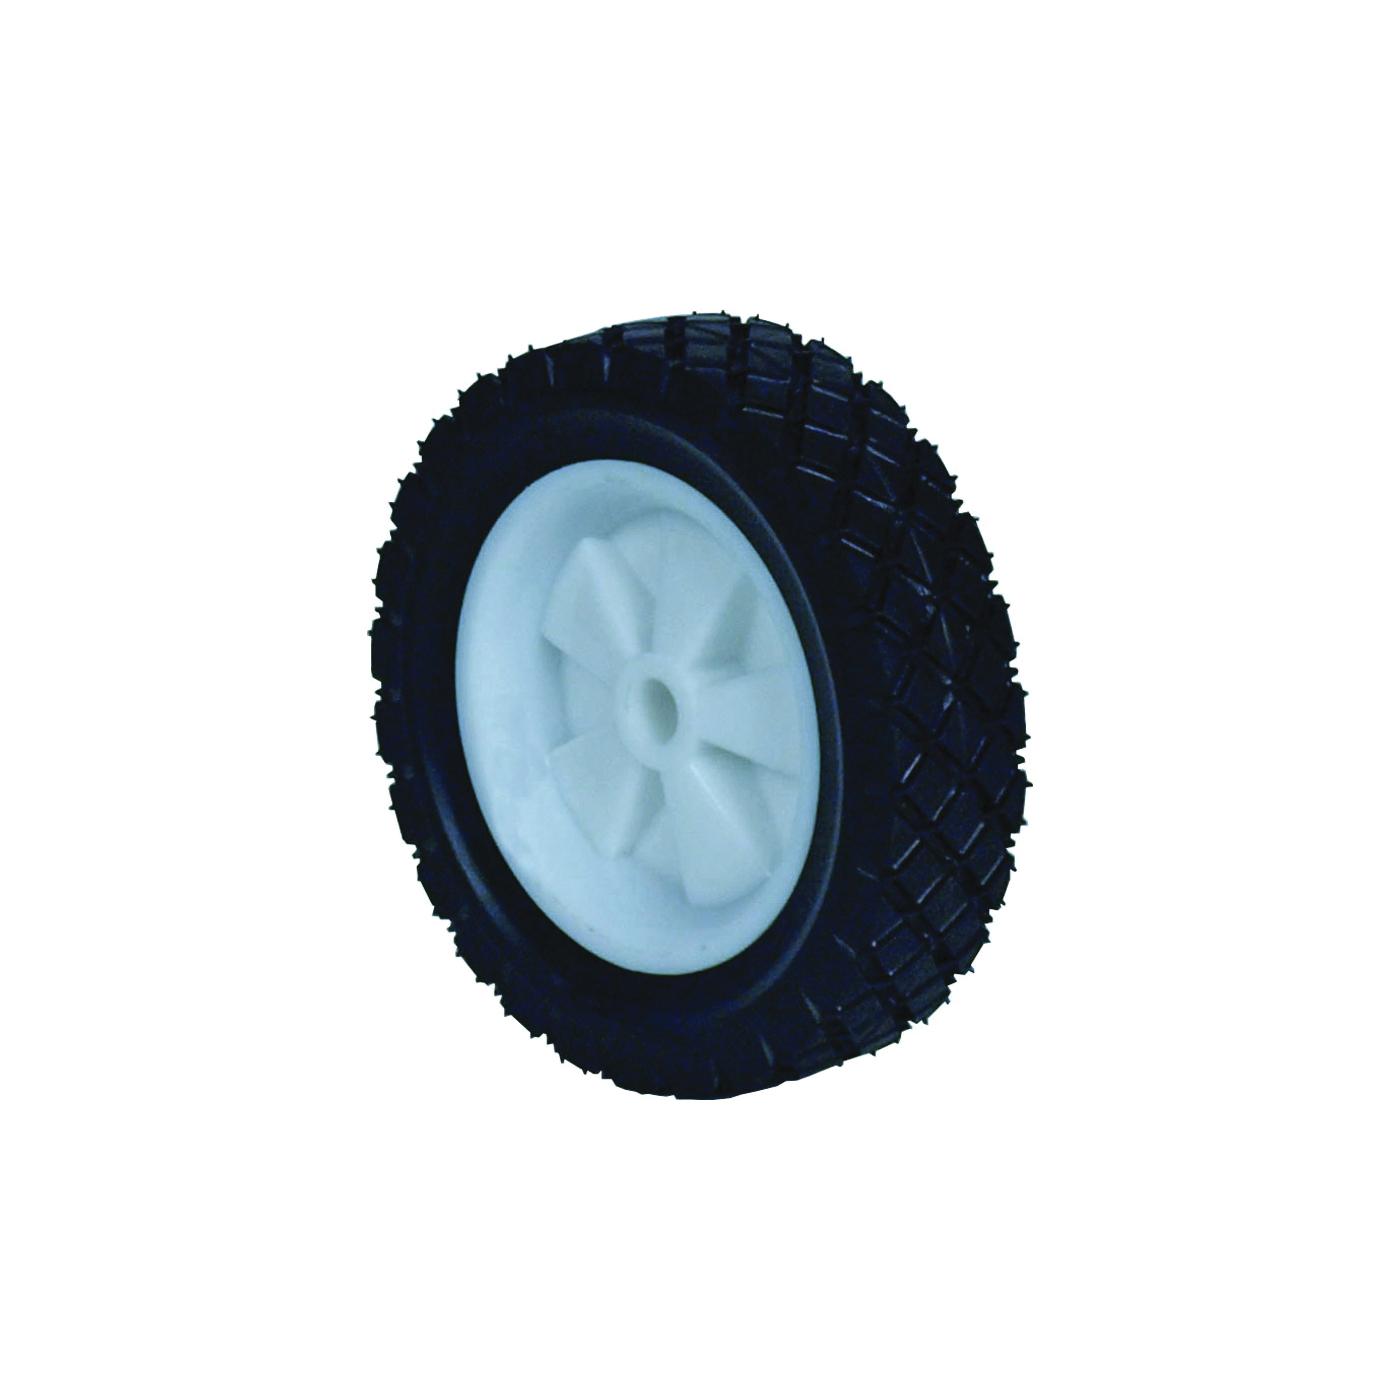 Picture of MARTIN WHEEL 615P-OF Lawn Mower Wheel, Semi-Pneumatic, Universal, Plastic/Rubber